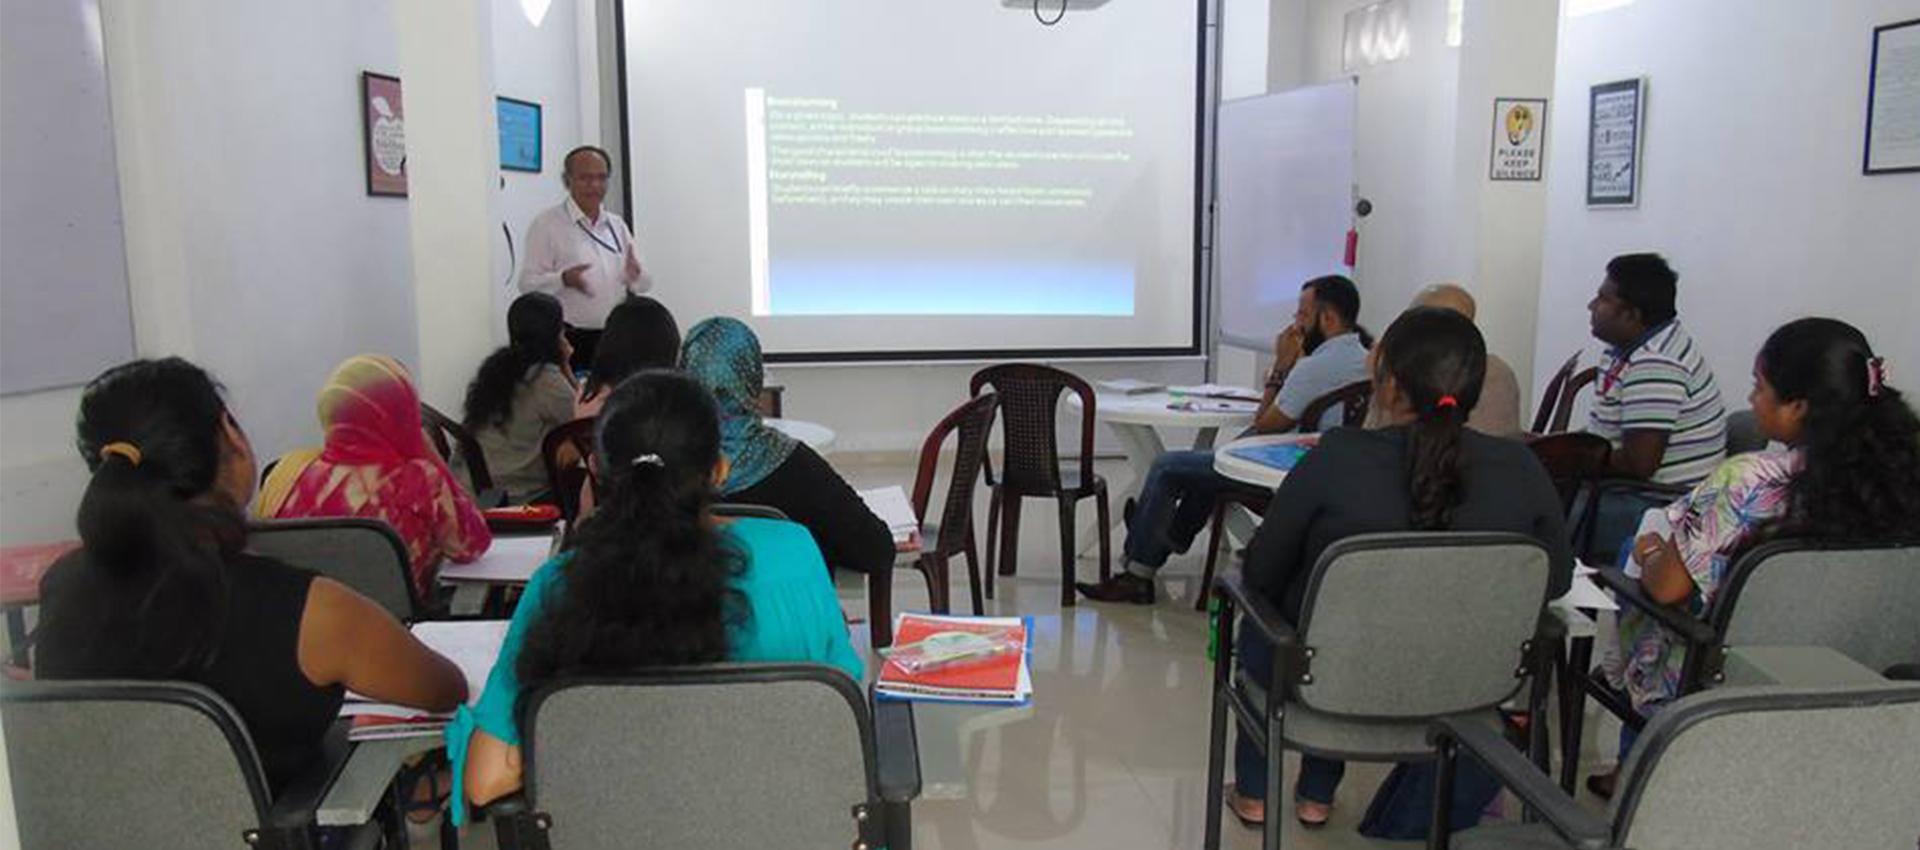 Yesman.lk - Cover Image - Lanka TEFL Training Institute